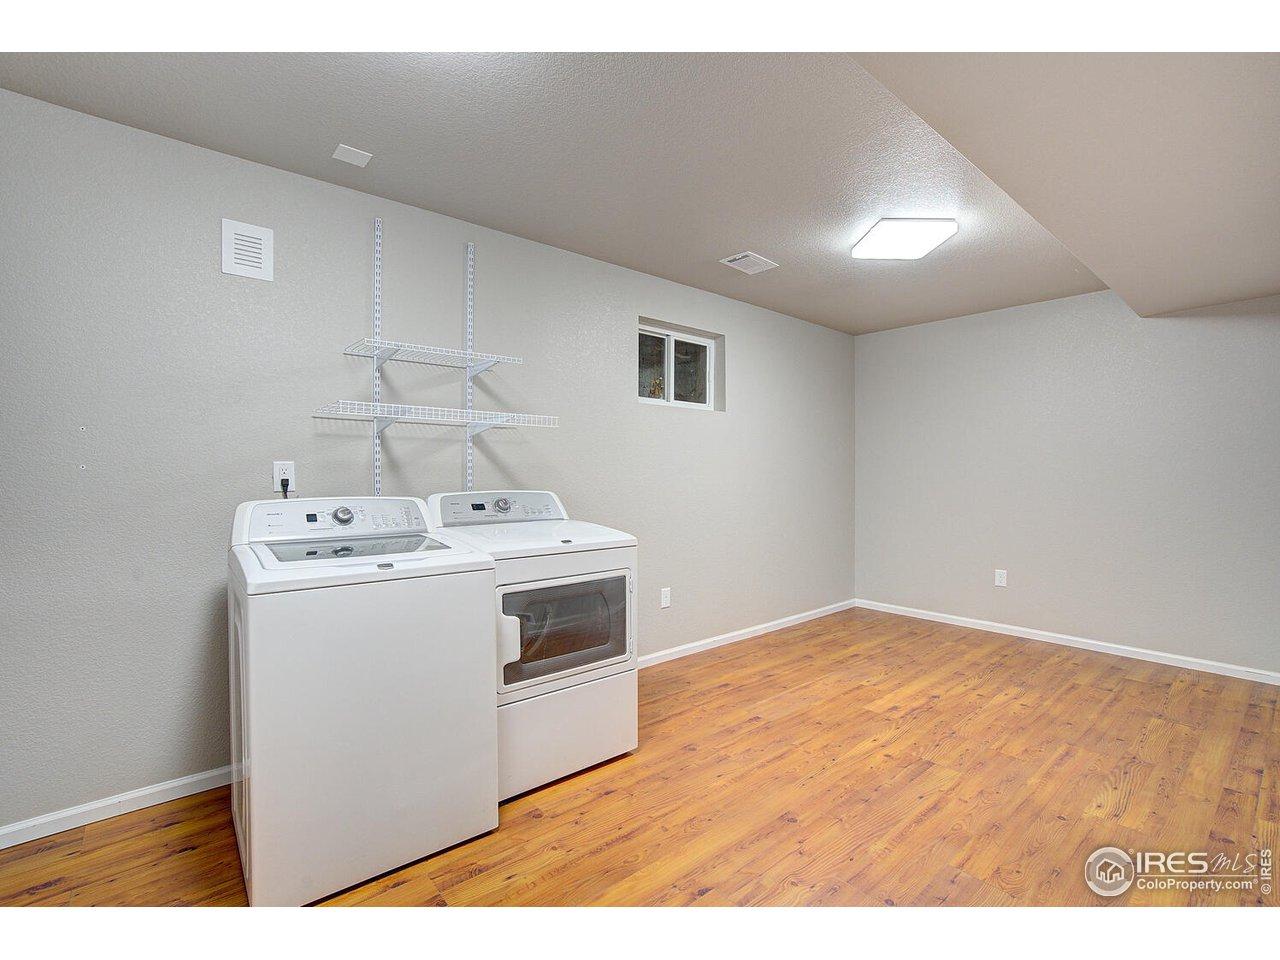 17 x 9 Laundry room